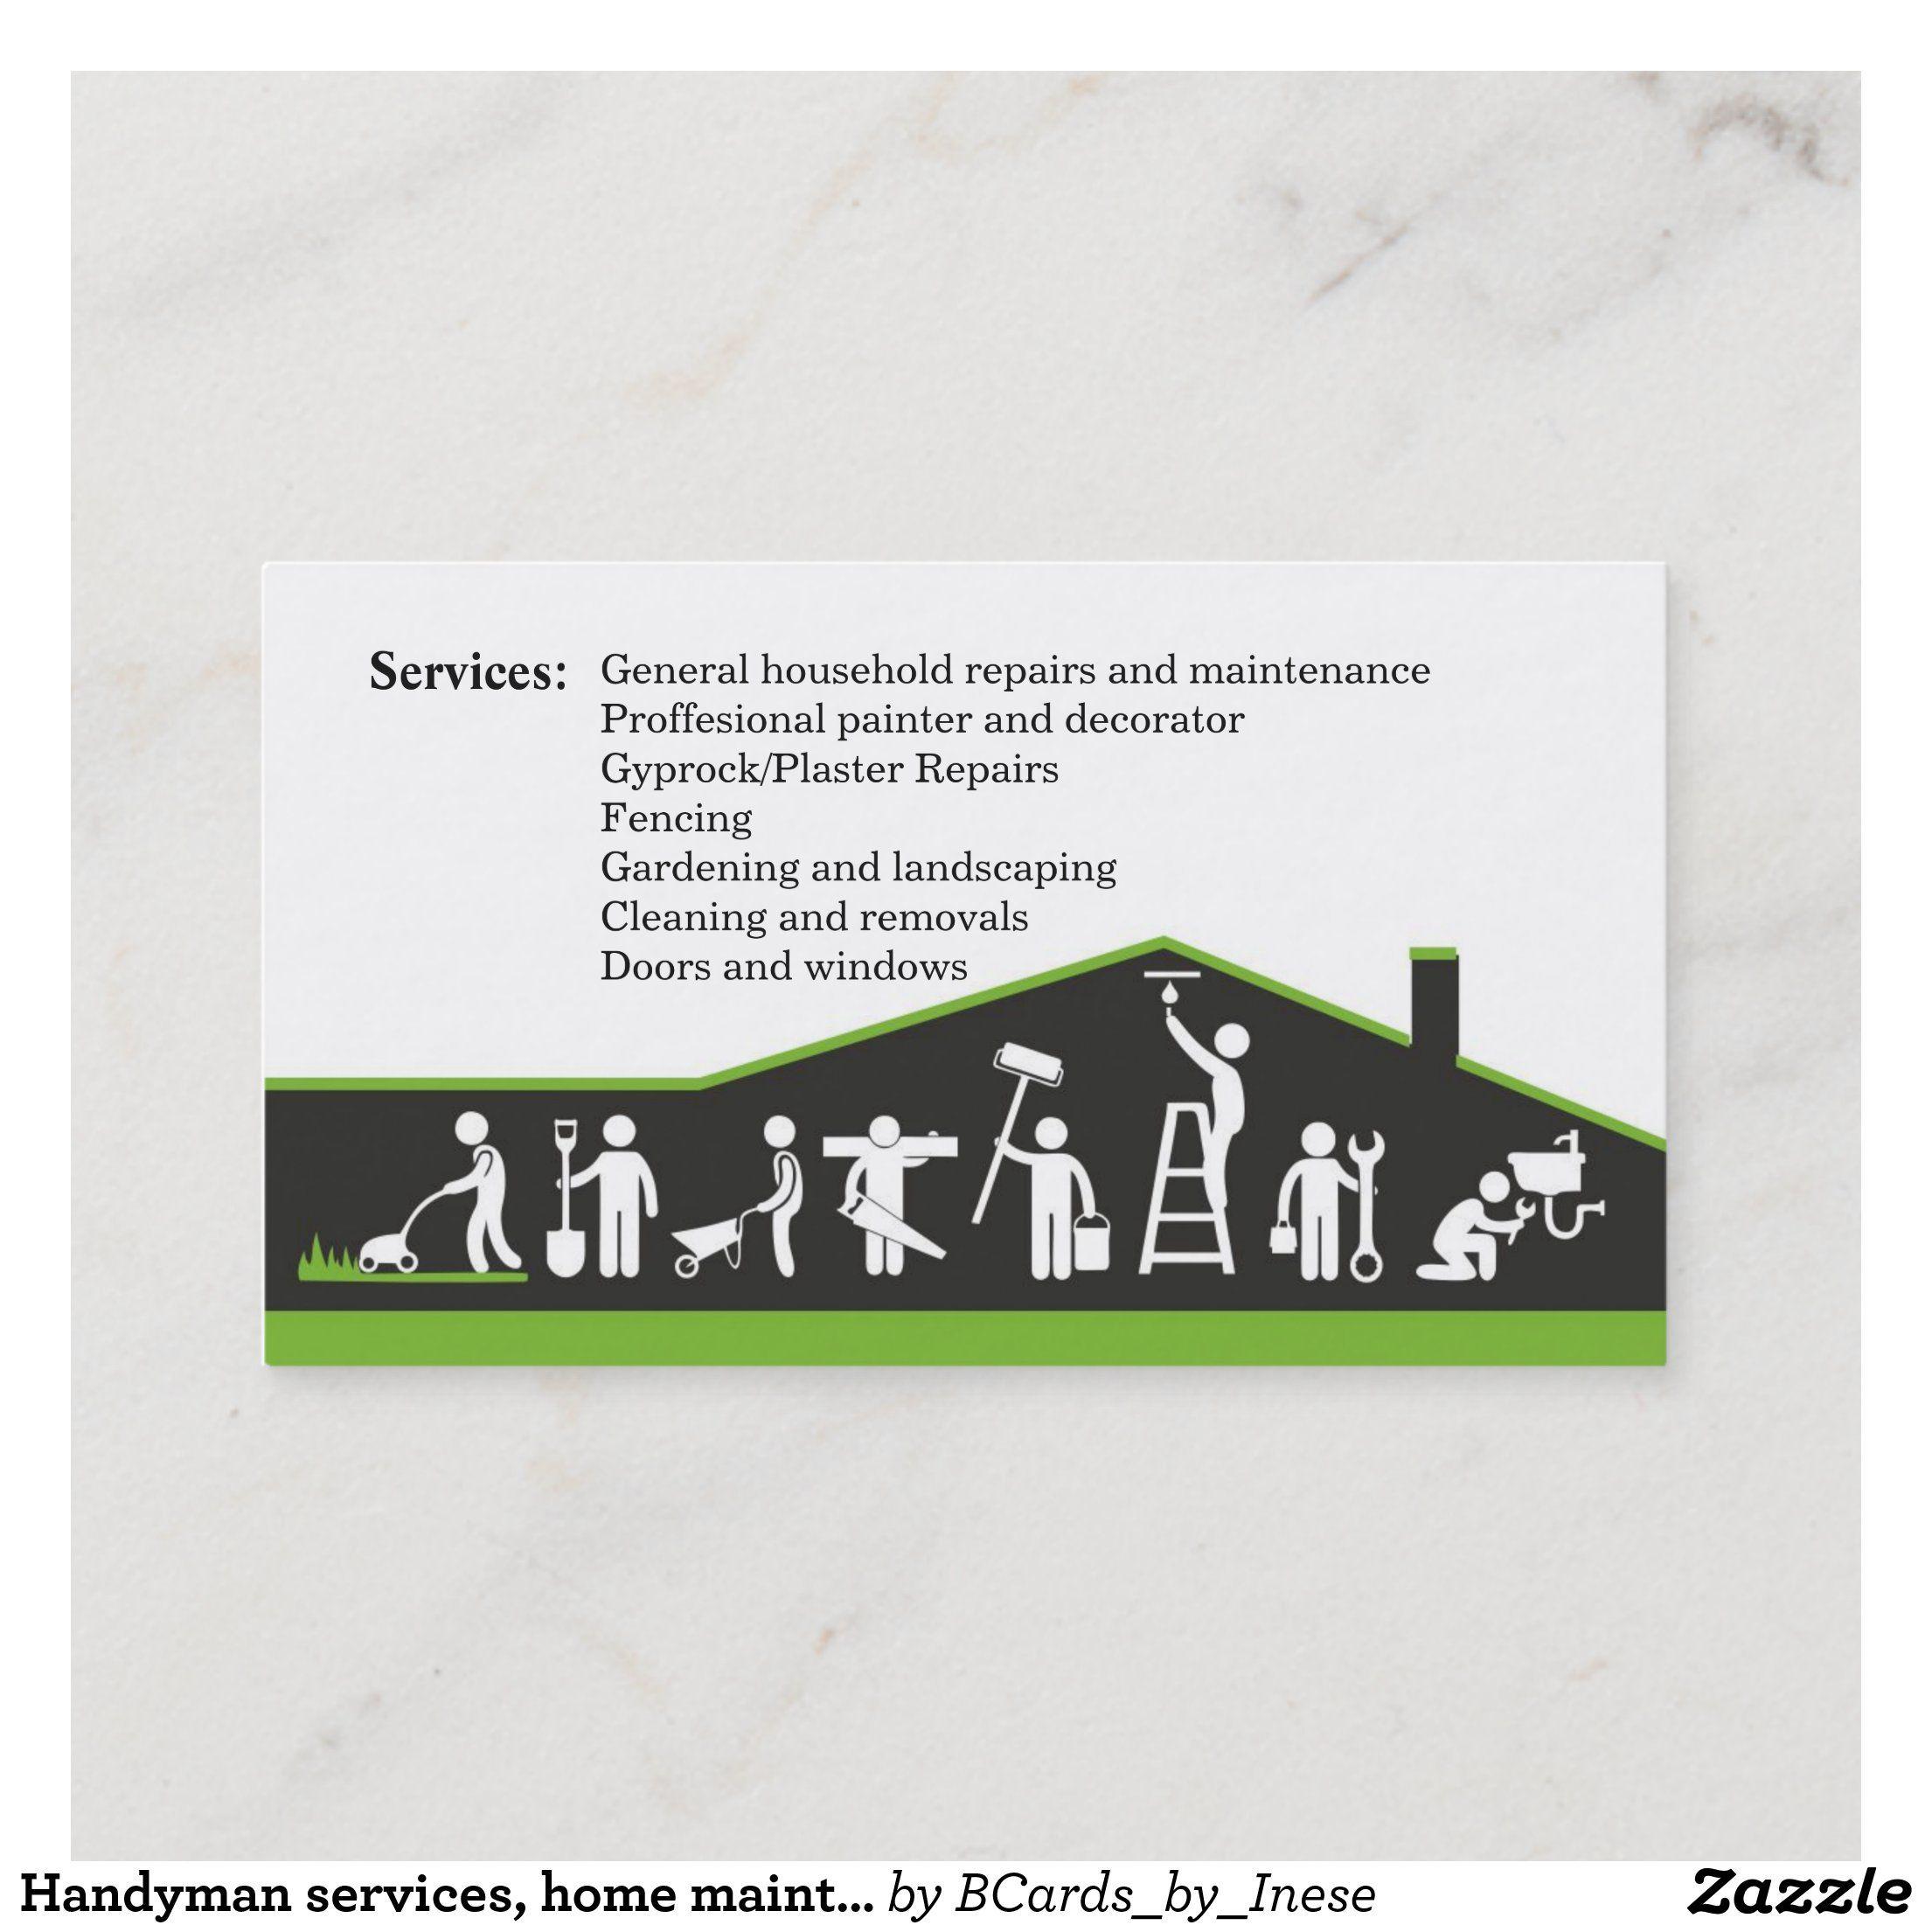 Handyman Services Home Maintenance Business Card Zazzle Com Handyman Services Remodeling Business Home Maintenance